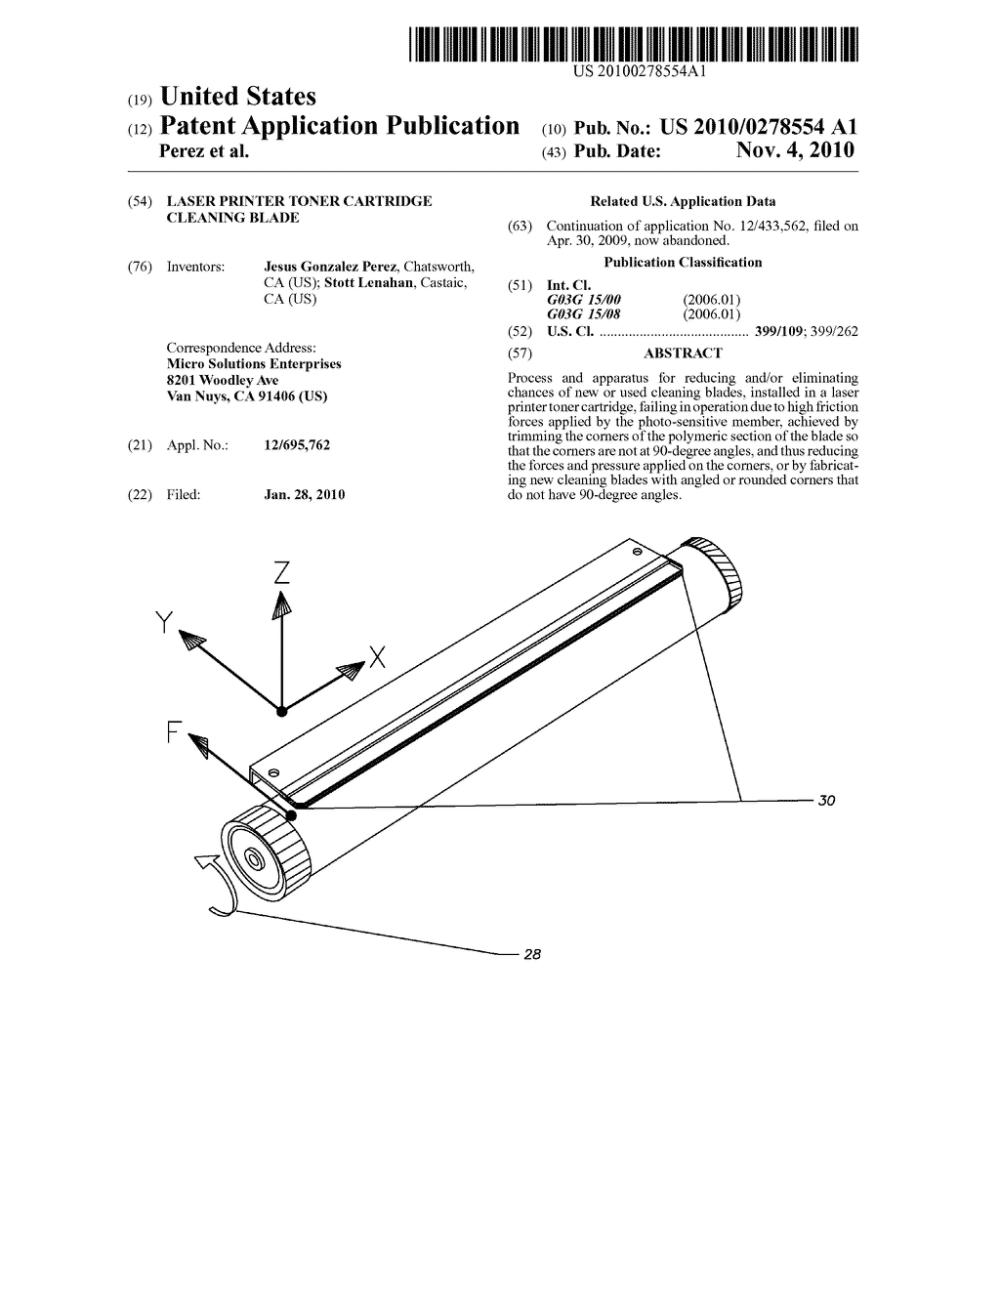 medium resolution of laser printer toner cartridge cleaning blade diagram schematic and image 01